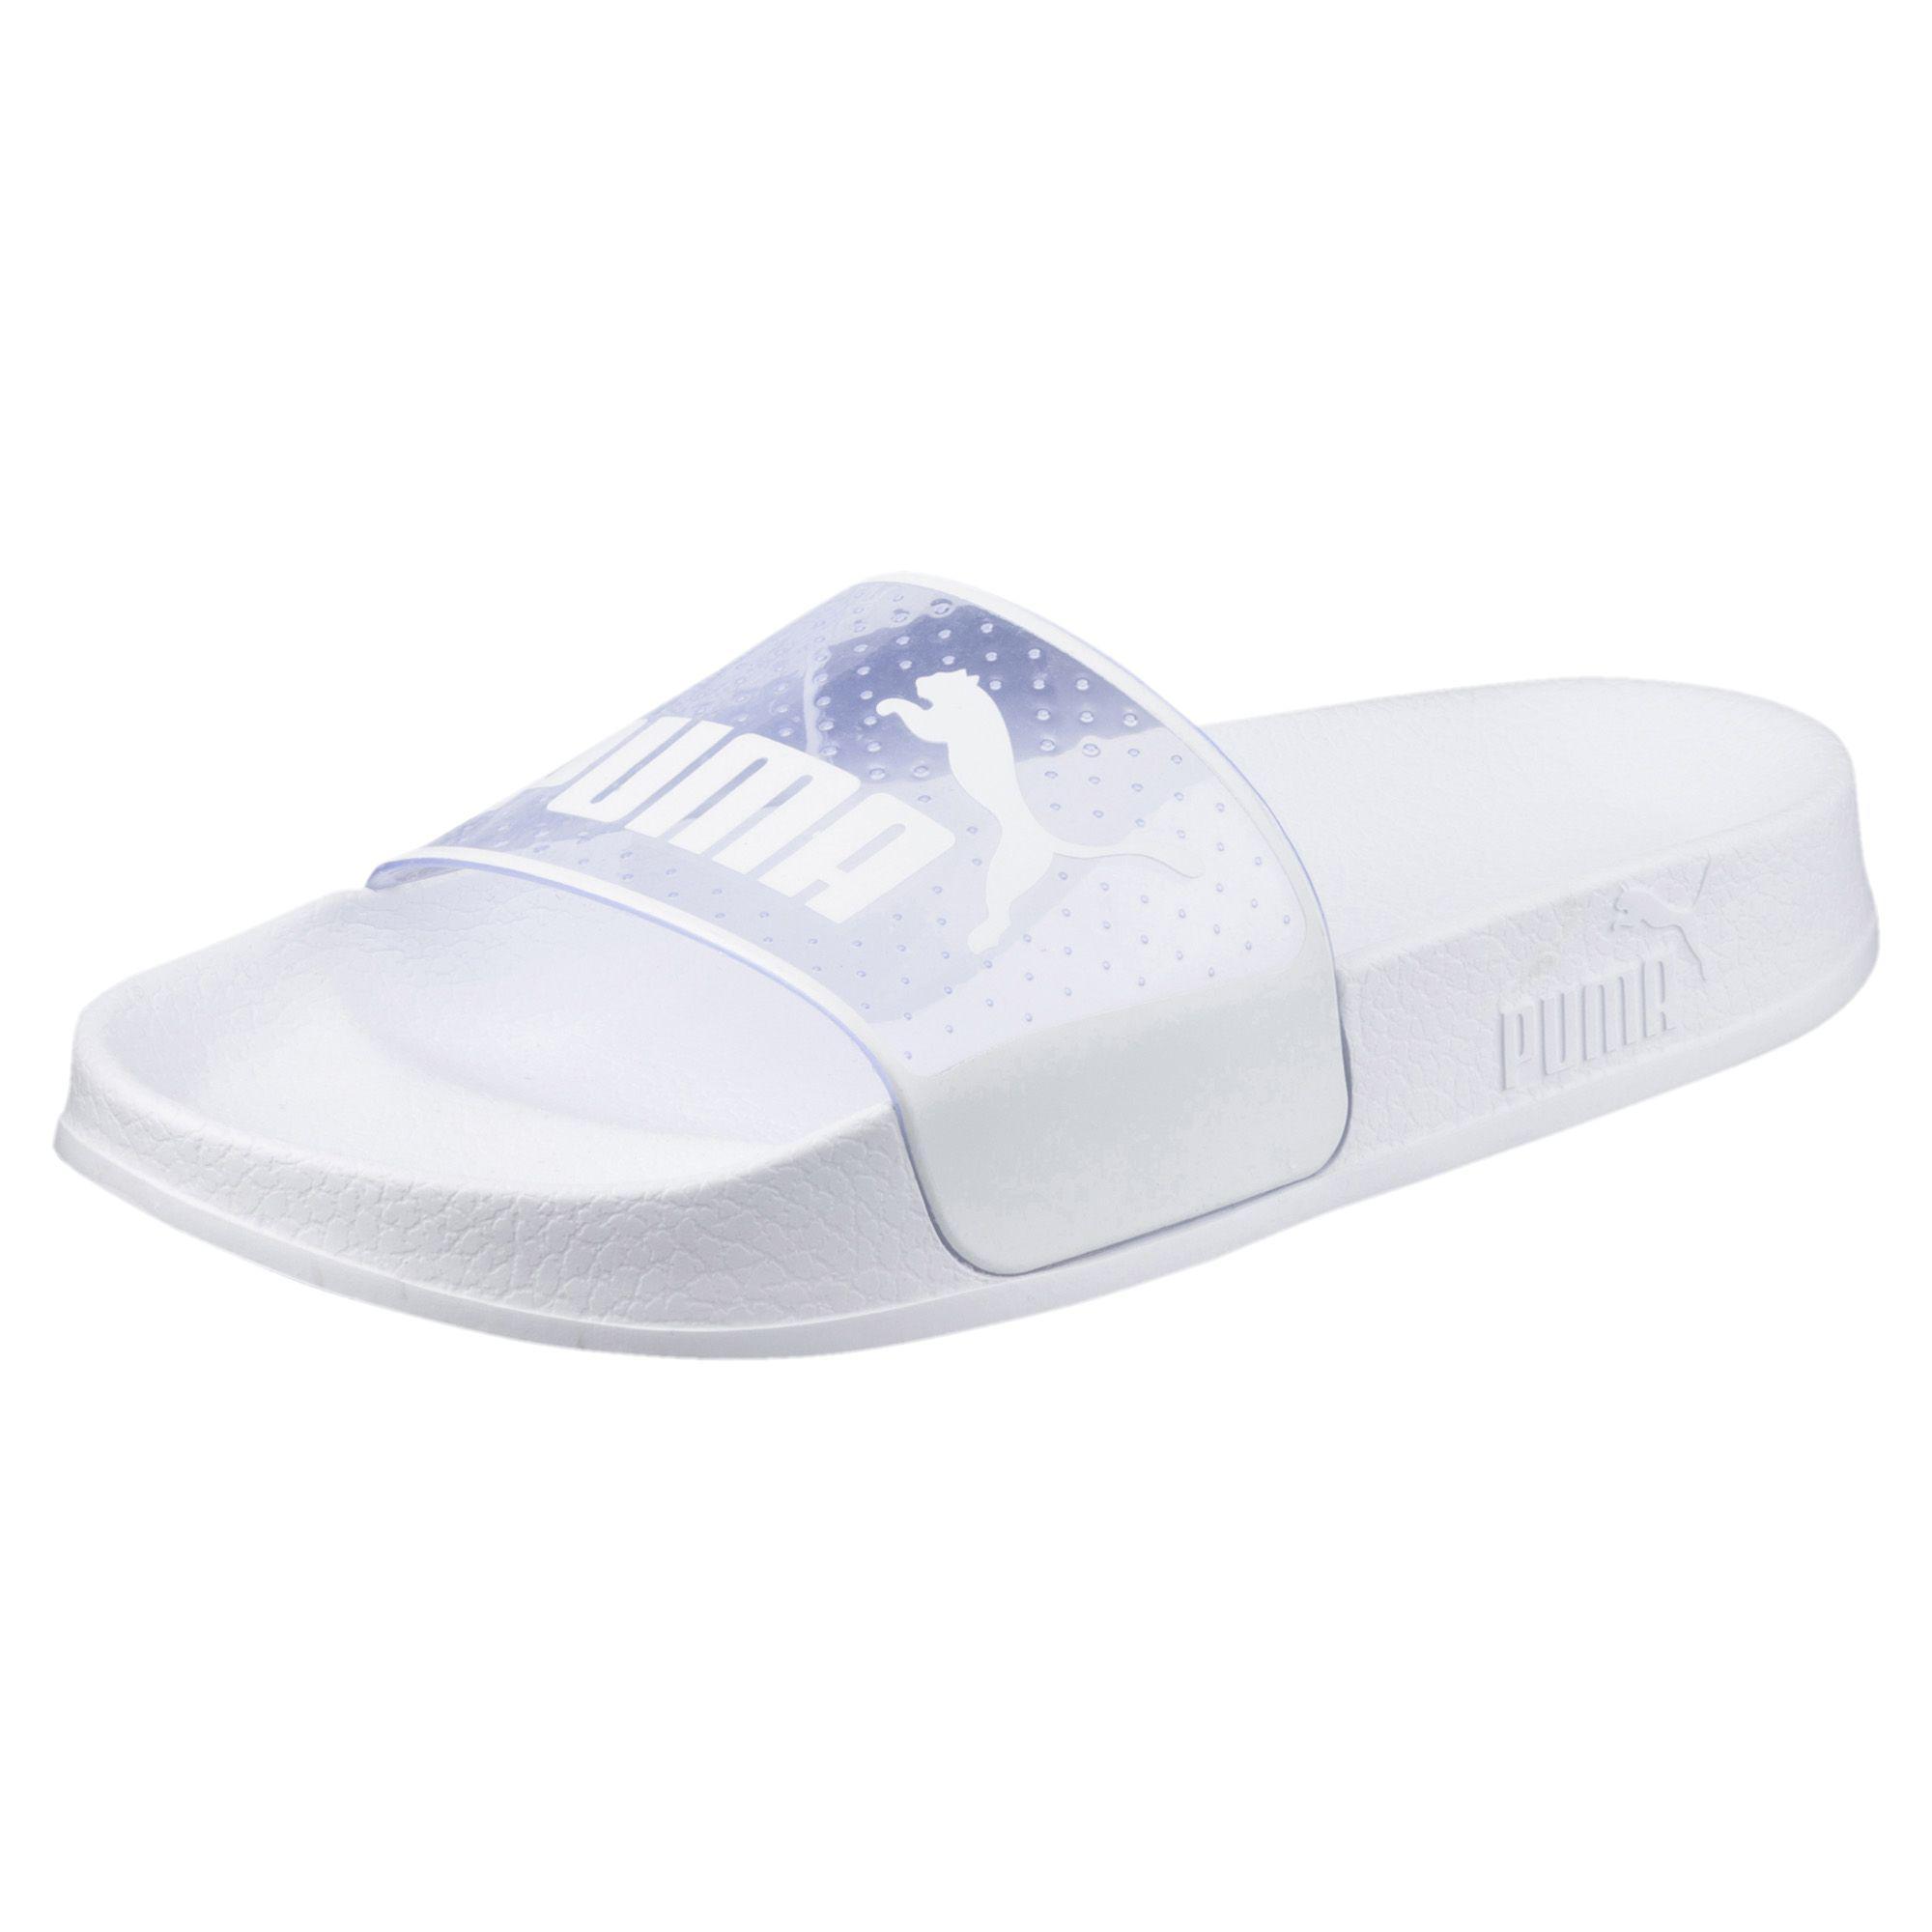 ca63029ff5cc ... Lyst - Puma Leadcat Jelly Women s Slide Sandals in White ...